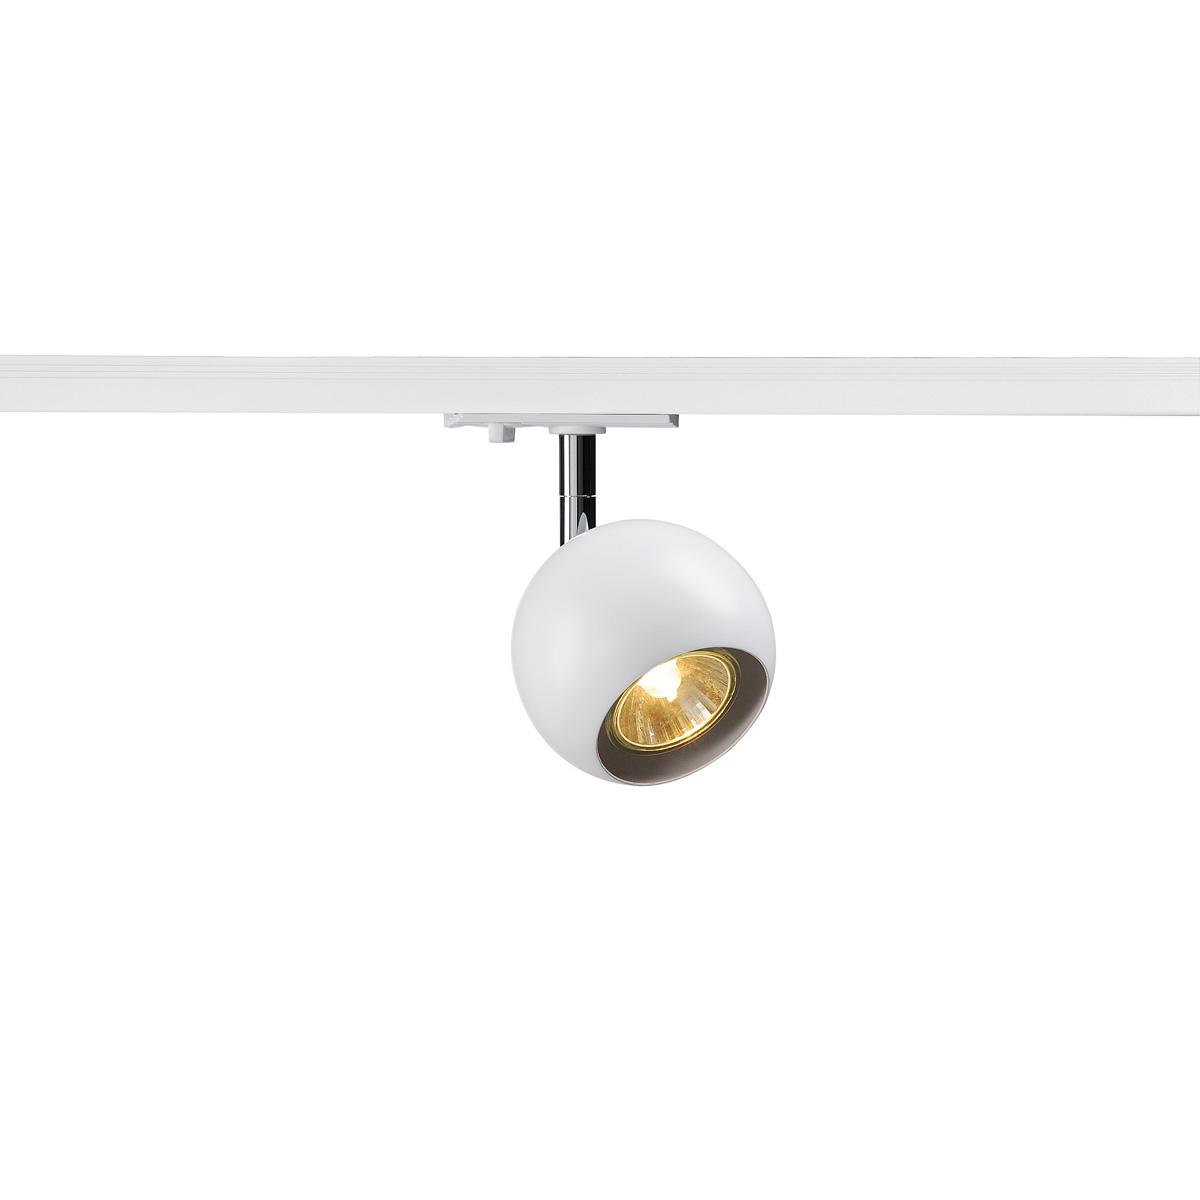 slv light eye spot f r 1 phasen stromschiene gu10 wei chrom 144011. Black Bedroom Furniture Sets. Home Design Ideas